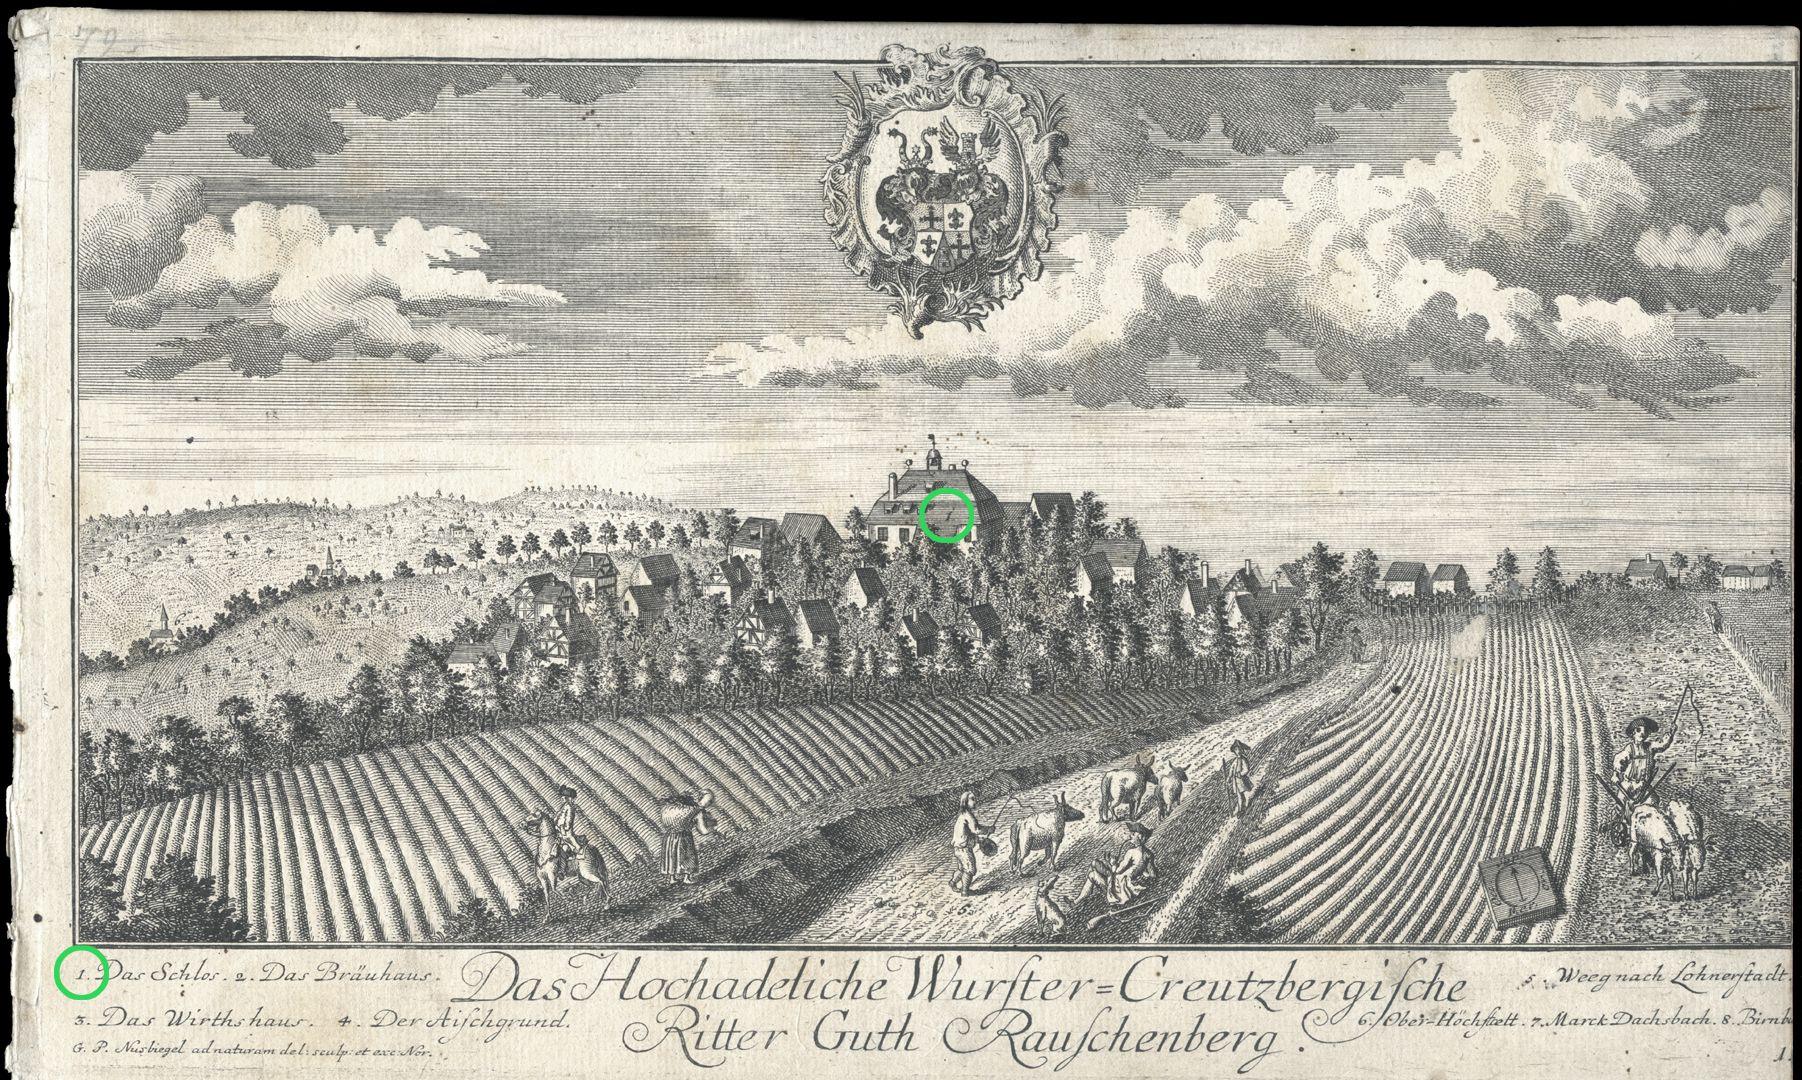 High-nobility-manor Rauschenberg of Wurster-Creutzberg Castle